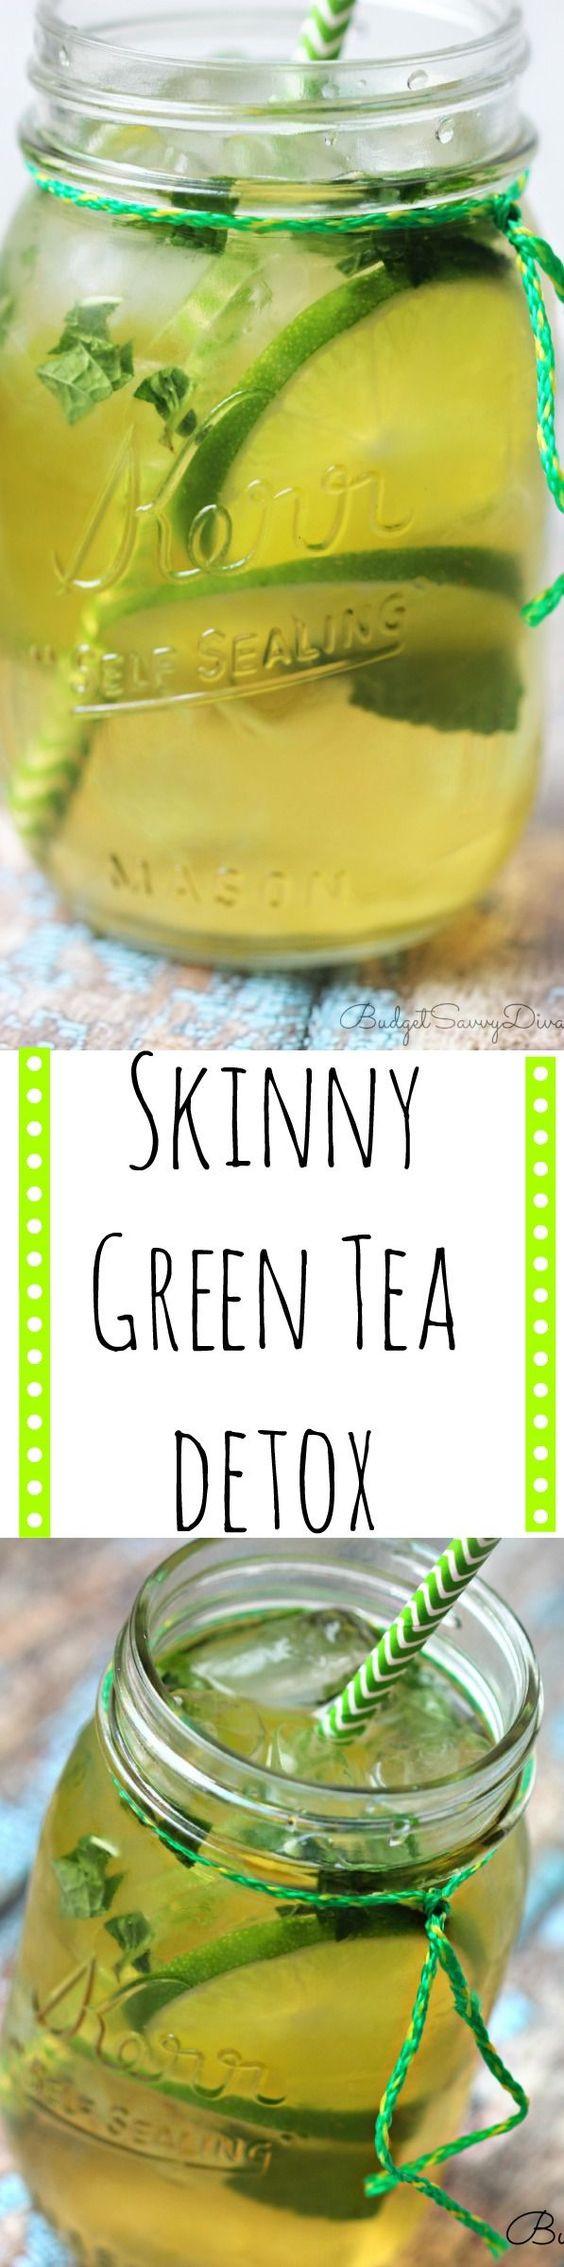 Green Tea Weight Loss Drink Detox Waters  Skinny Green Tea Detox Recipe